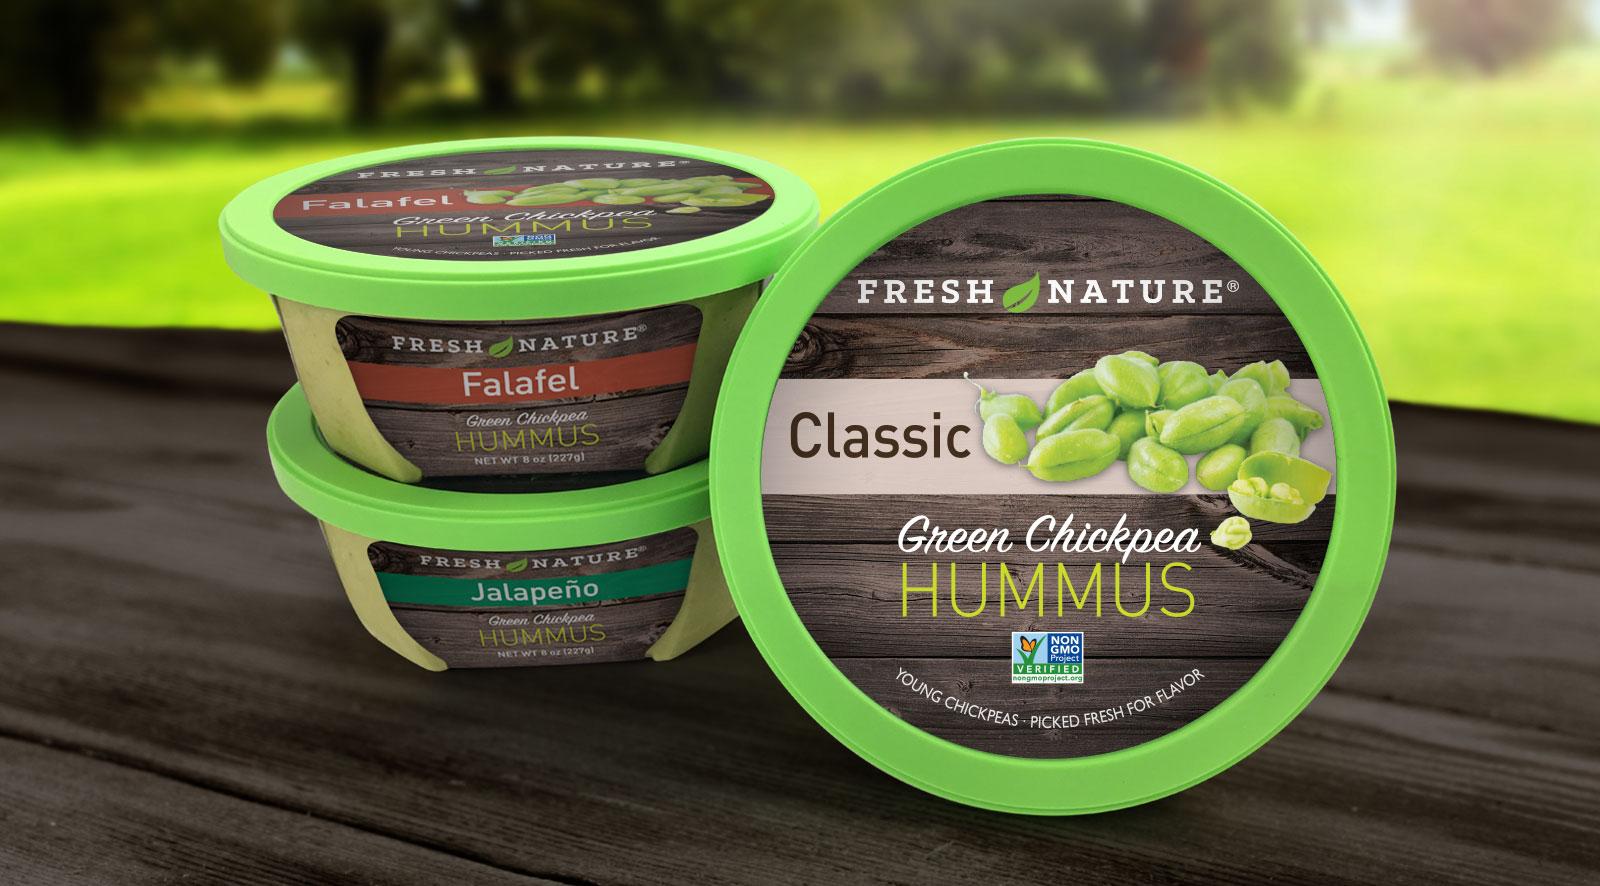 green-chickpea-hummus-3-Fresh-flavors.jpg